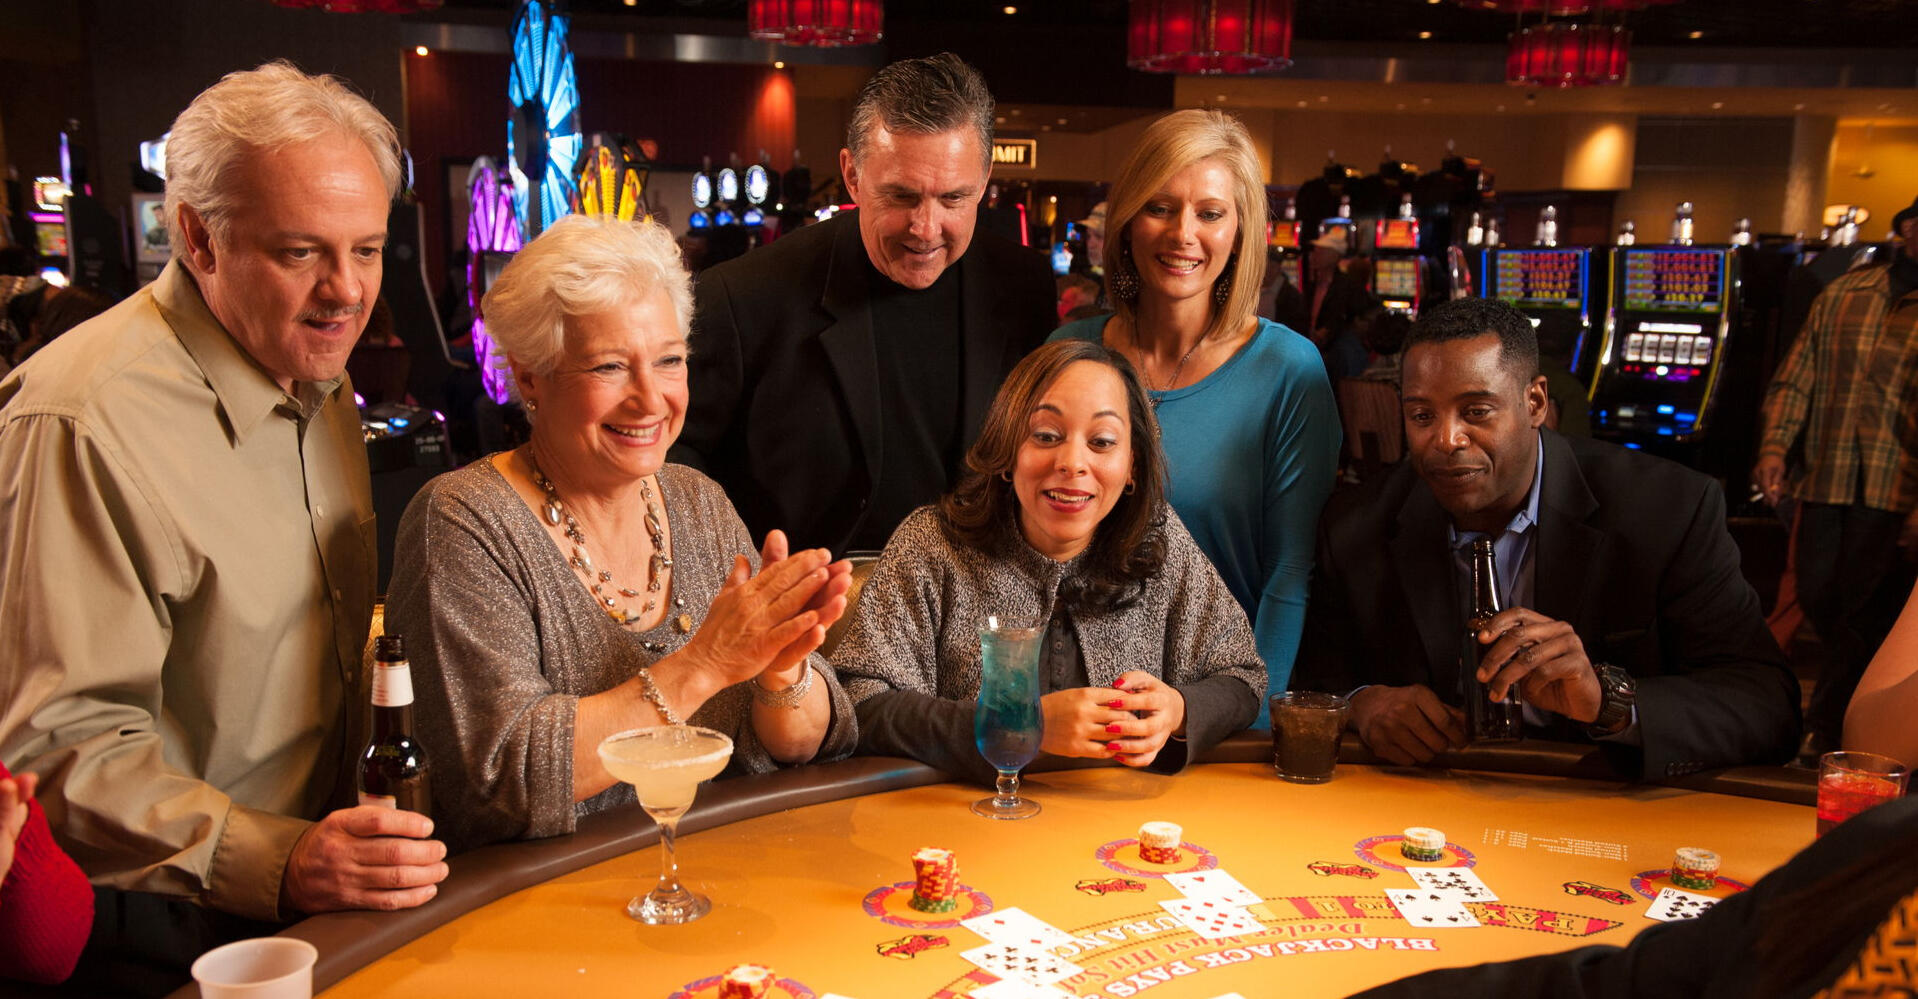 Pearl River Resort | Philadelphia MS Casinos & Hotels